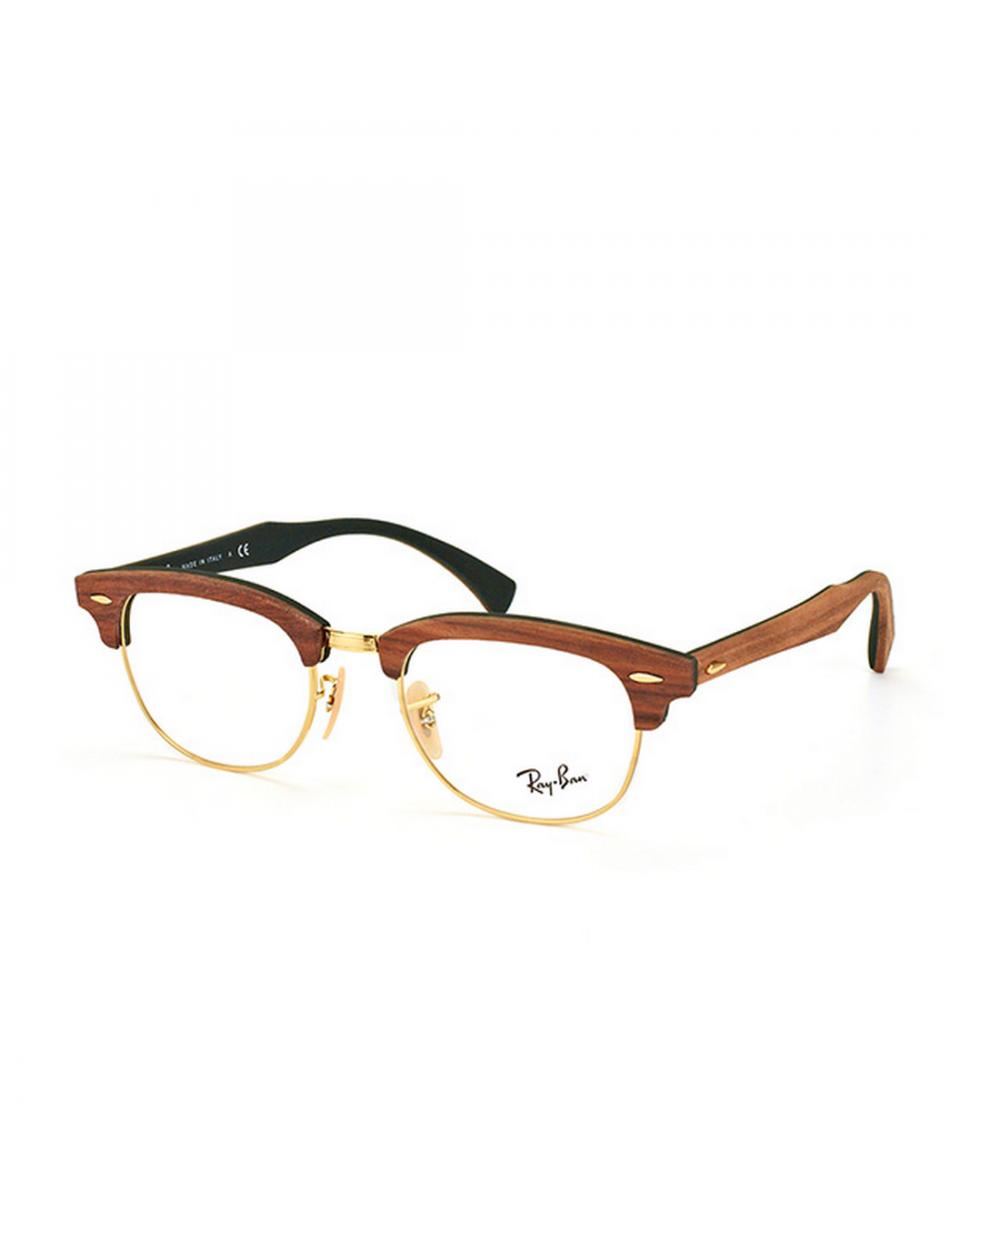 Glasses eyeglasses Ray Ban original package warranty Italy